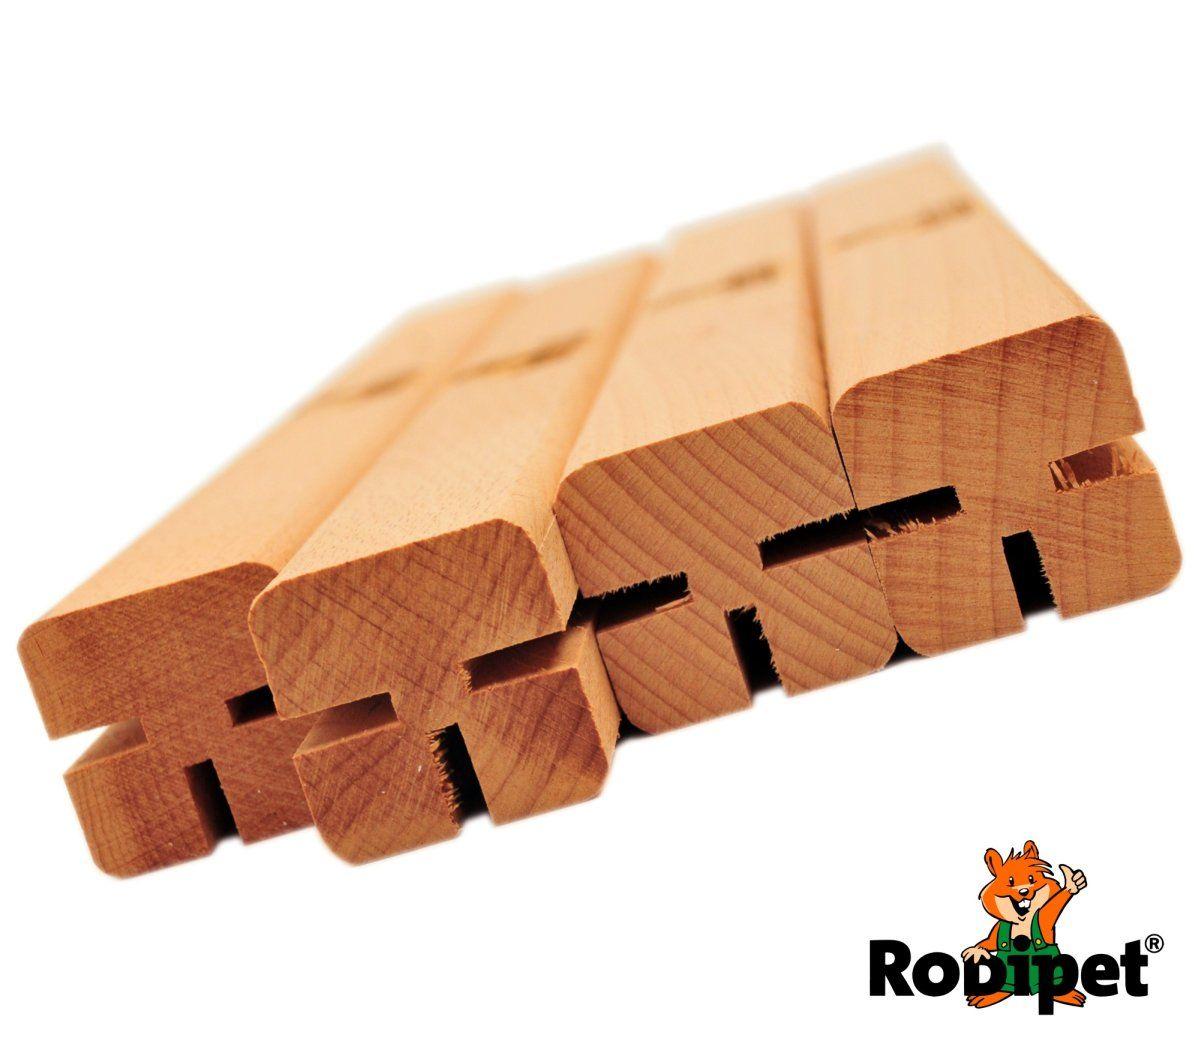 Rodipet Auslaufpfosten 4x Buchenholz Pfosten Holz